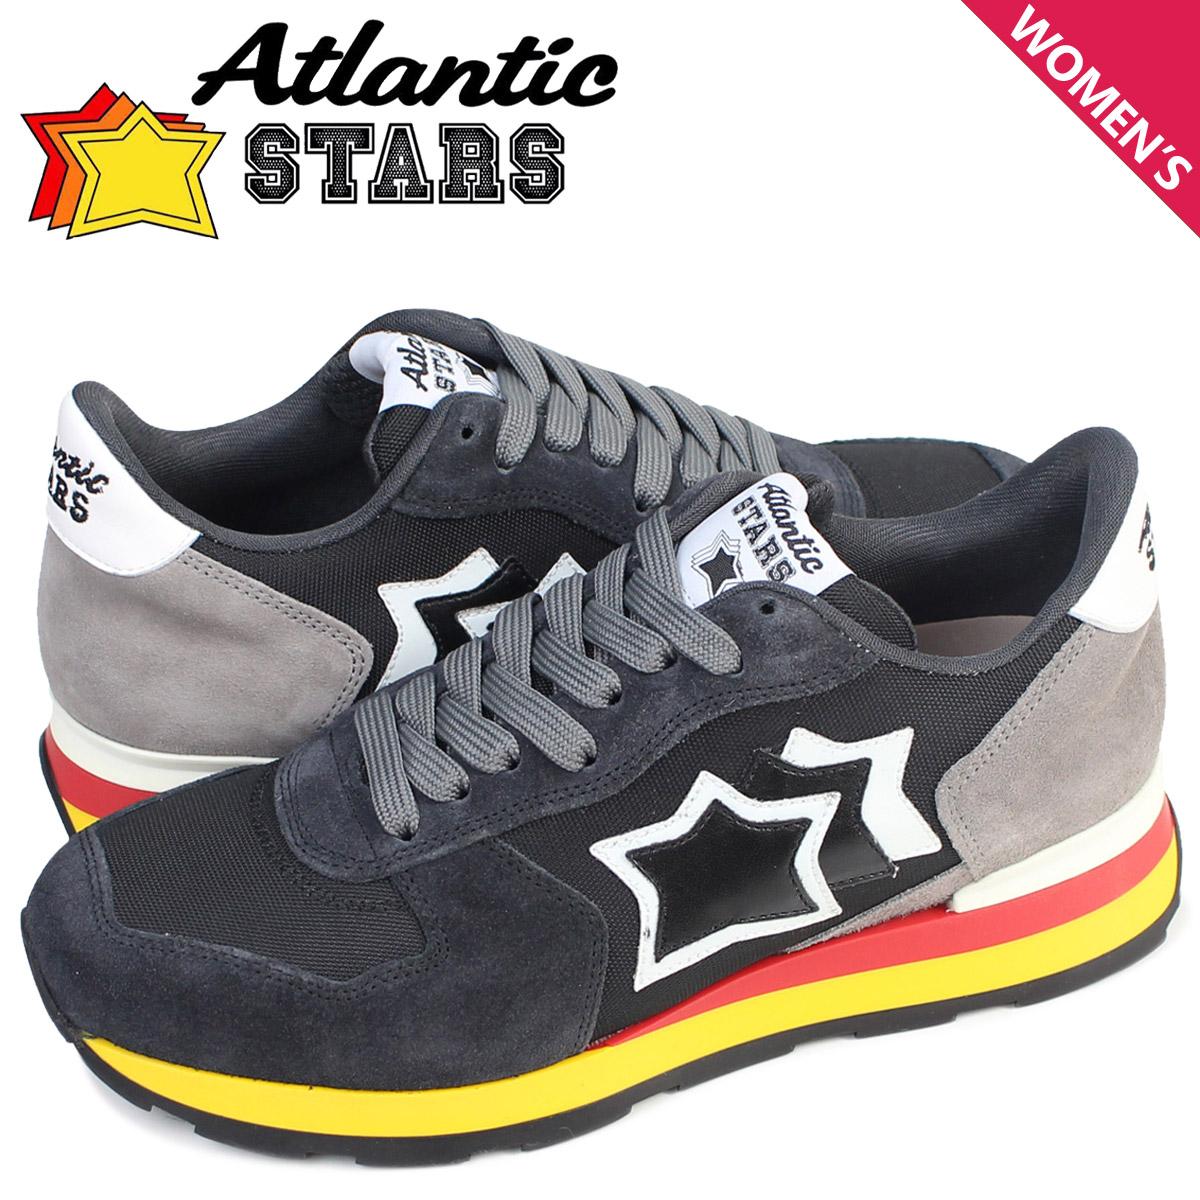 Atlantic STARS レディース スニーカー アトランティックスターズ ベガ VEGA AB 89B 靴 ネイビー